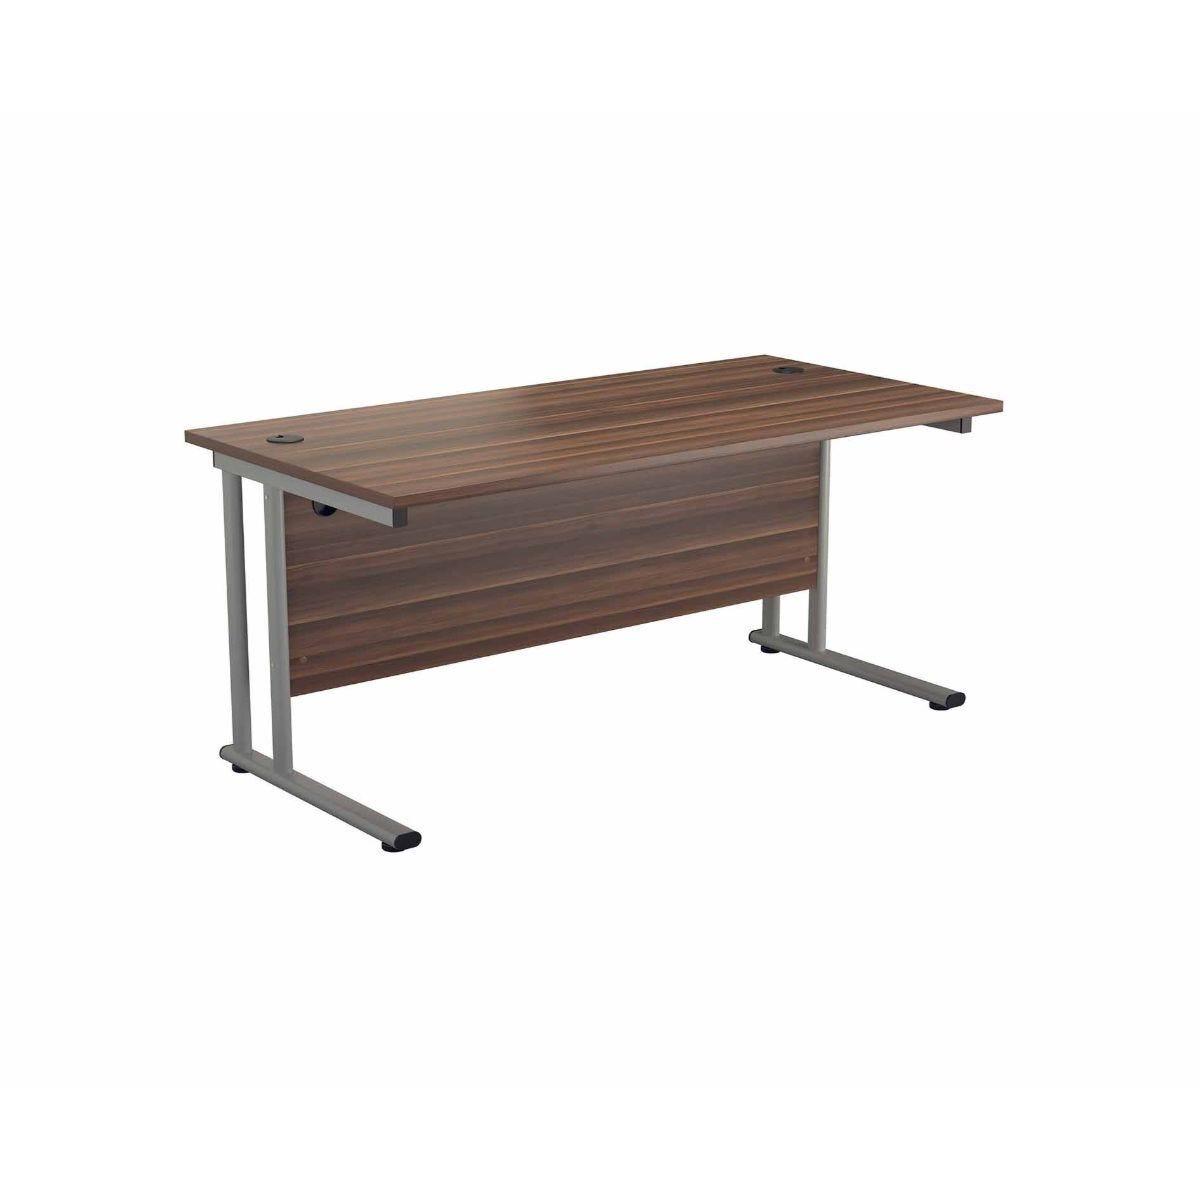 TC Office Start Silver Cantilever Frame Desk 1400x800mm Dark Walnut